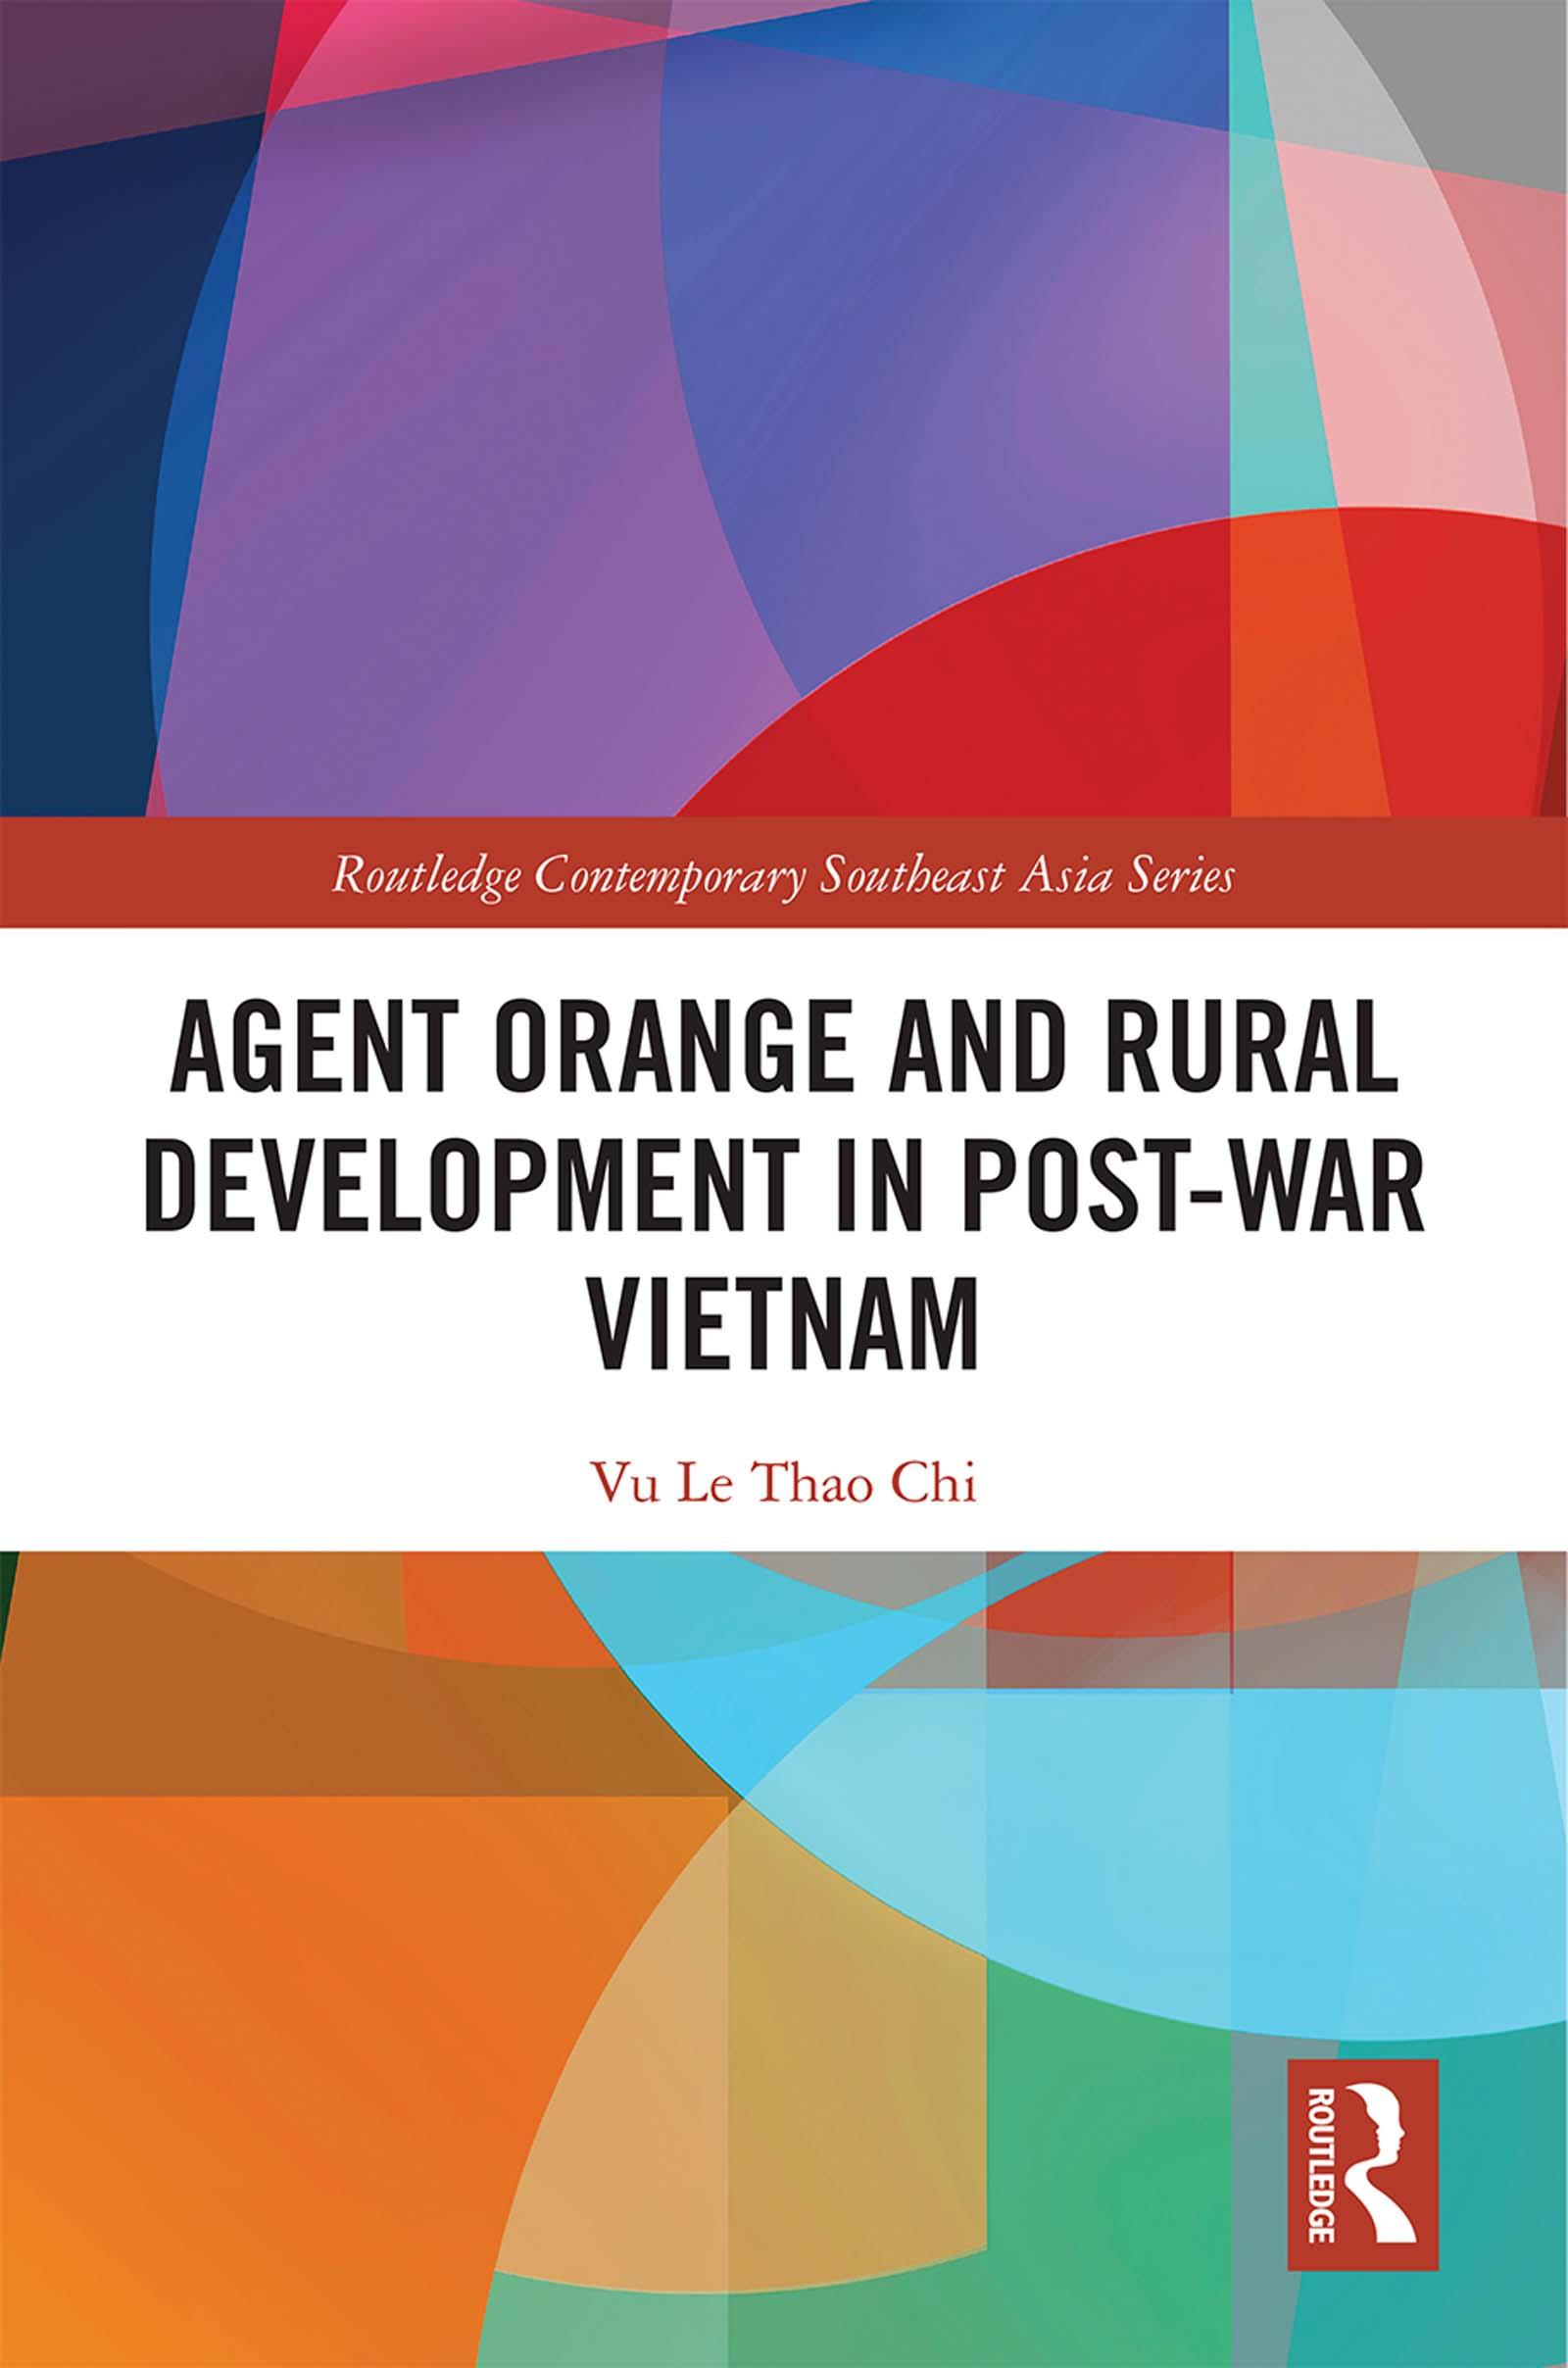 Agent Orange and Rural Development in Post-war Vietnam book cover